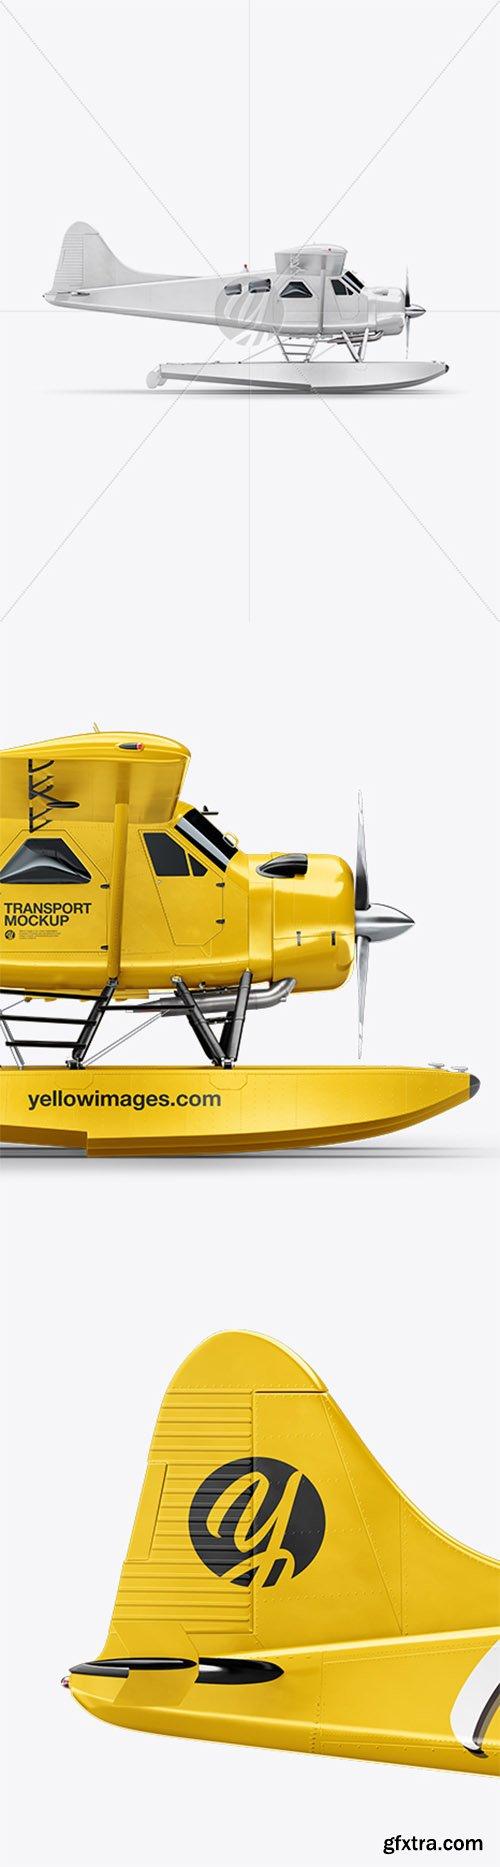 Seaplane Mockup - Side View 32716